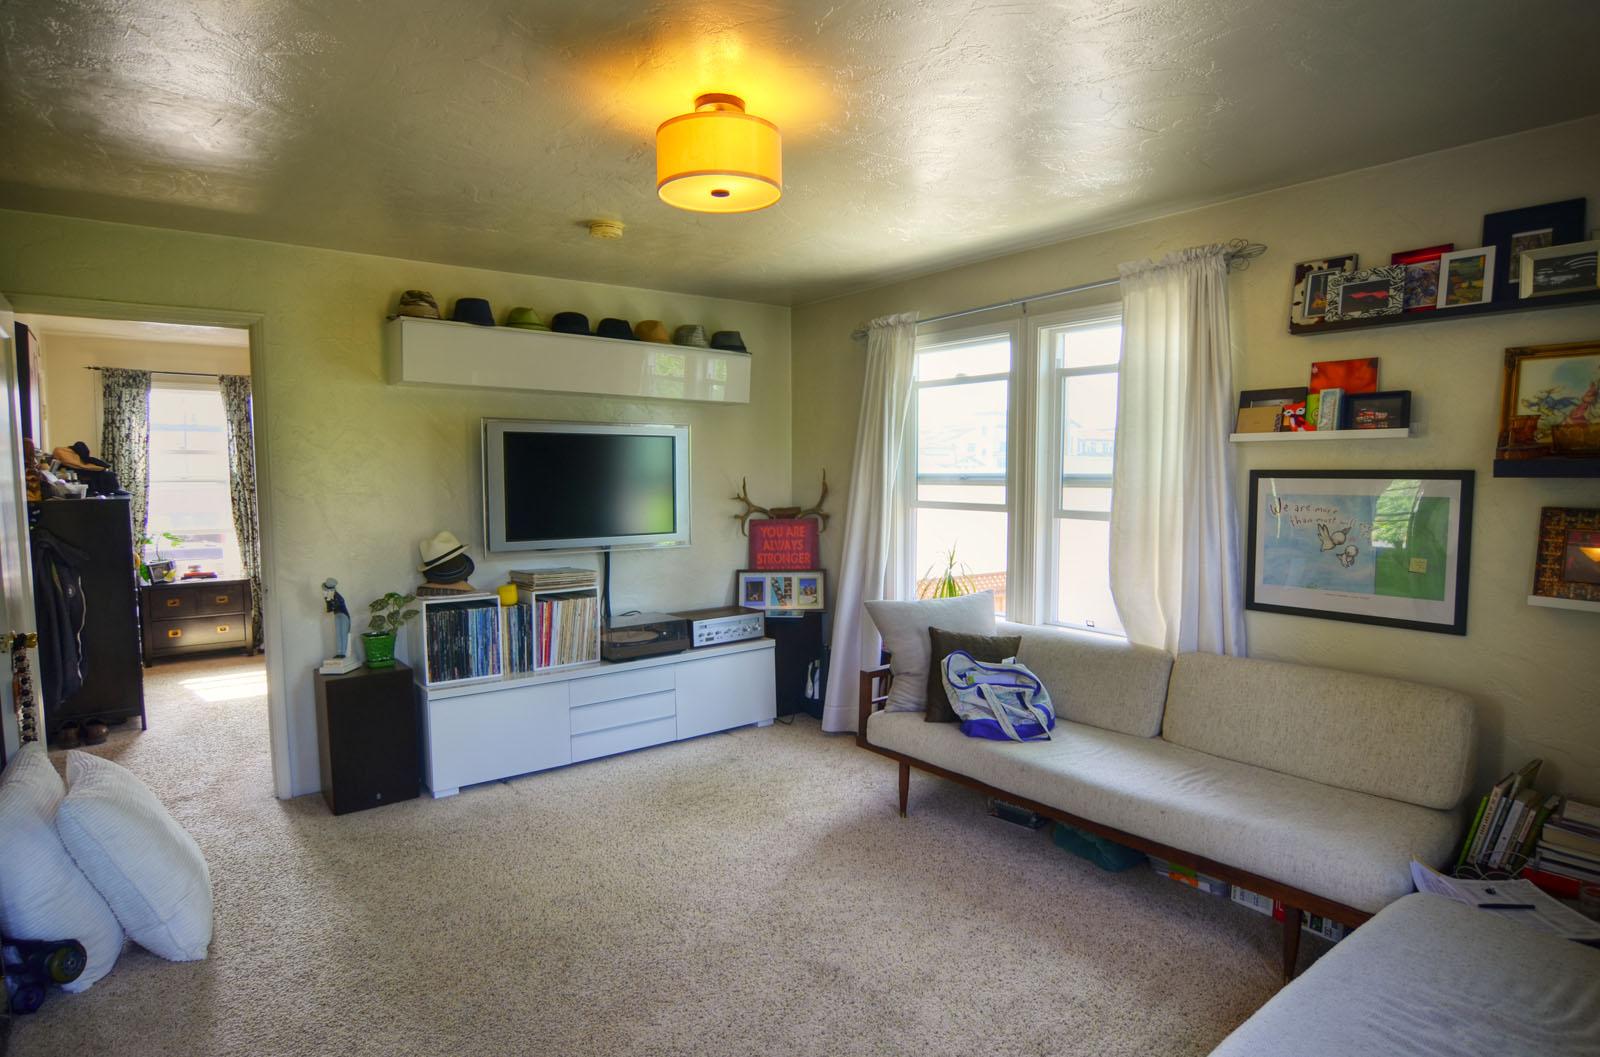 Living Room Ave U Menu Montagnaproperties Inc Professional Property Management